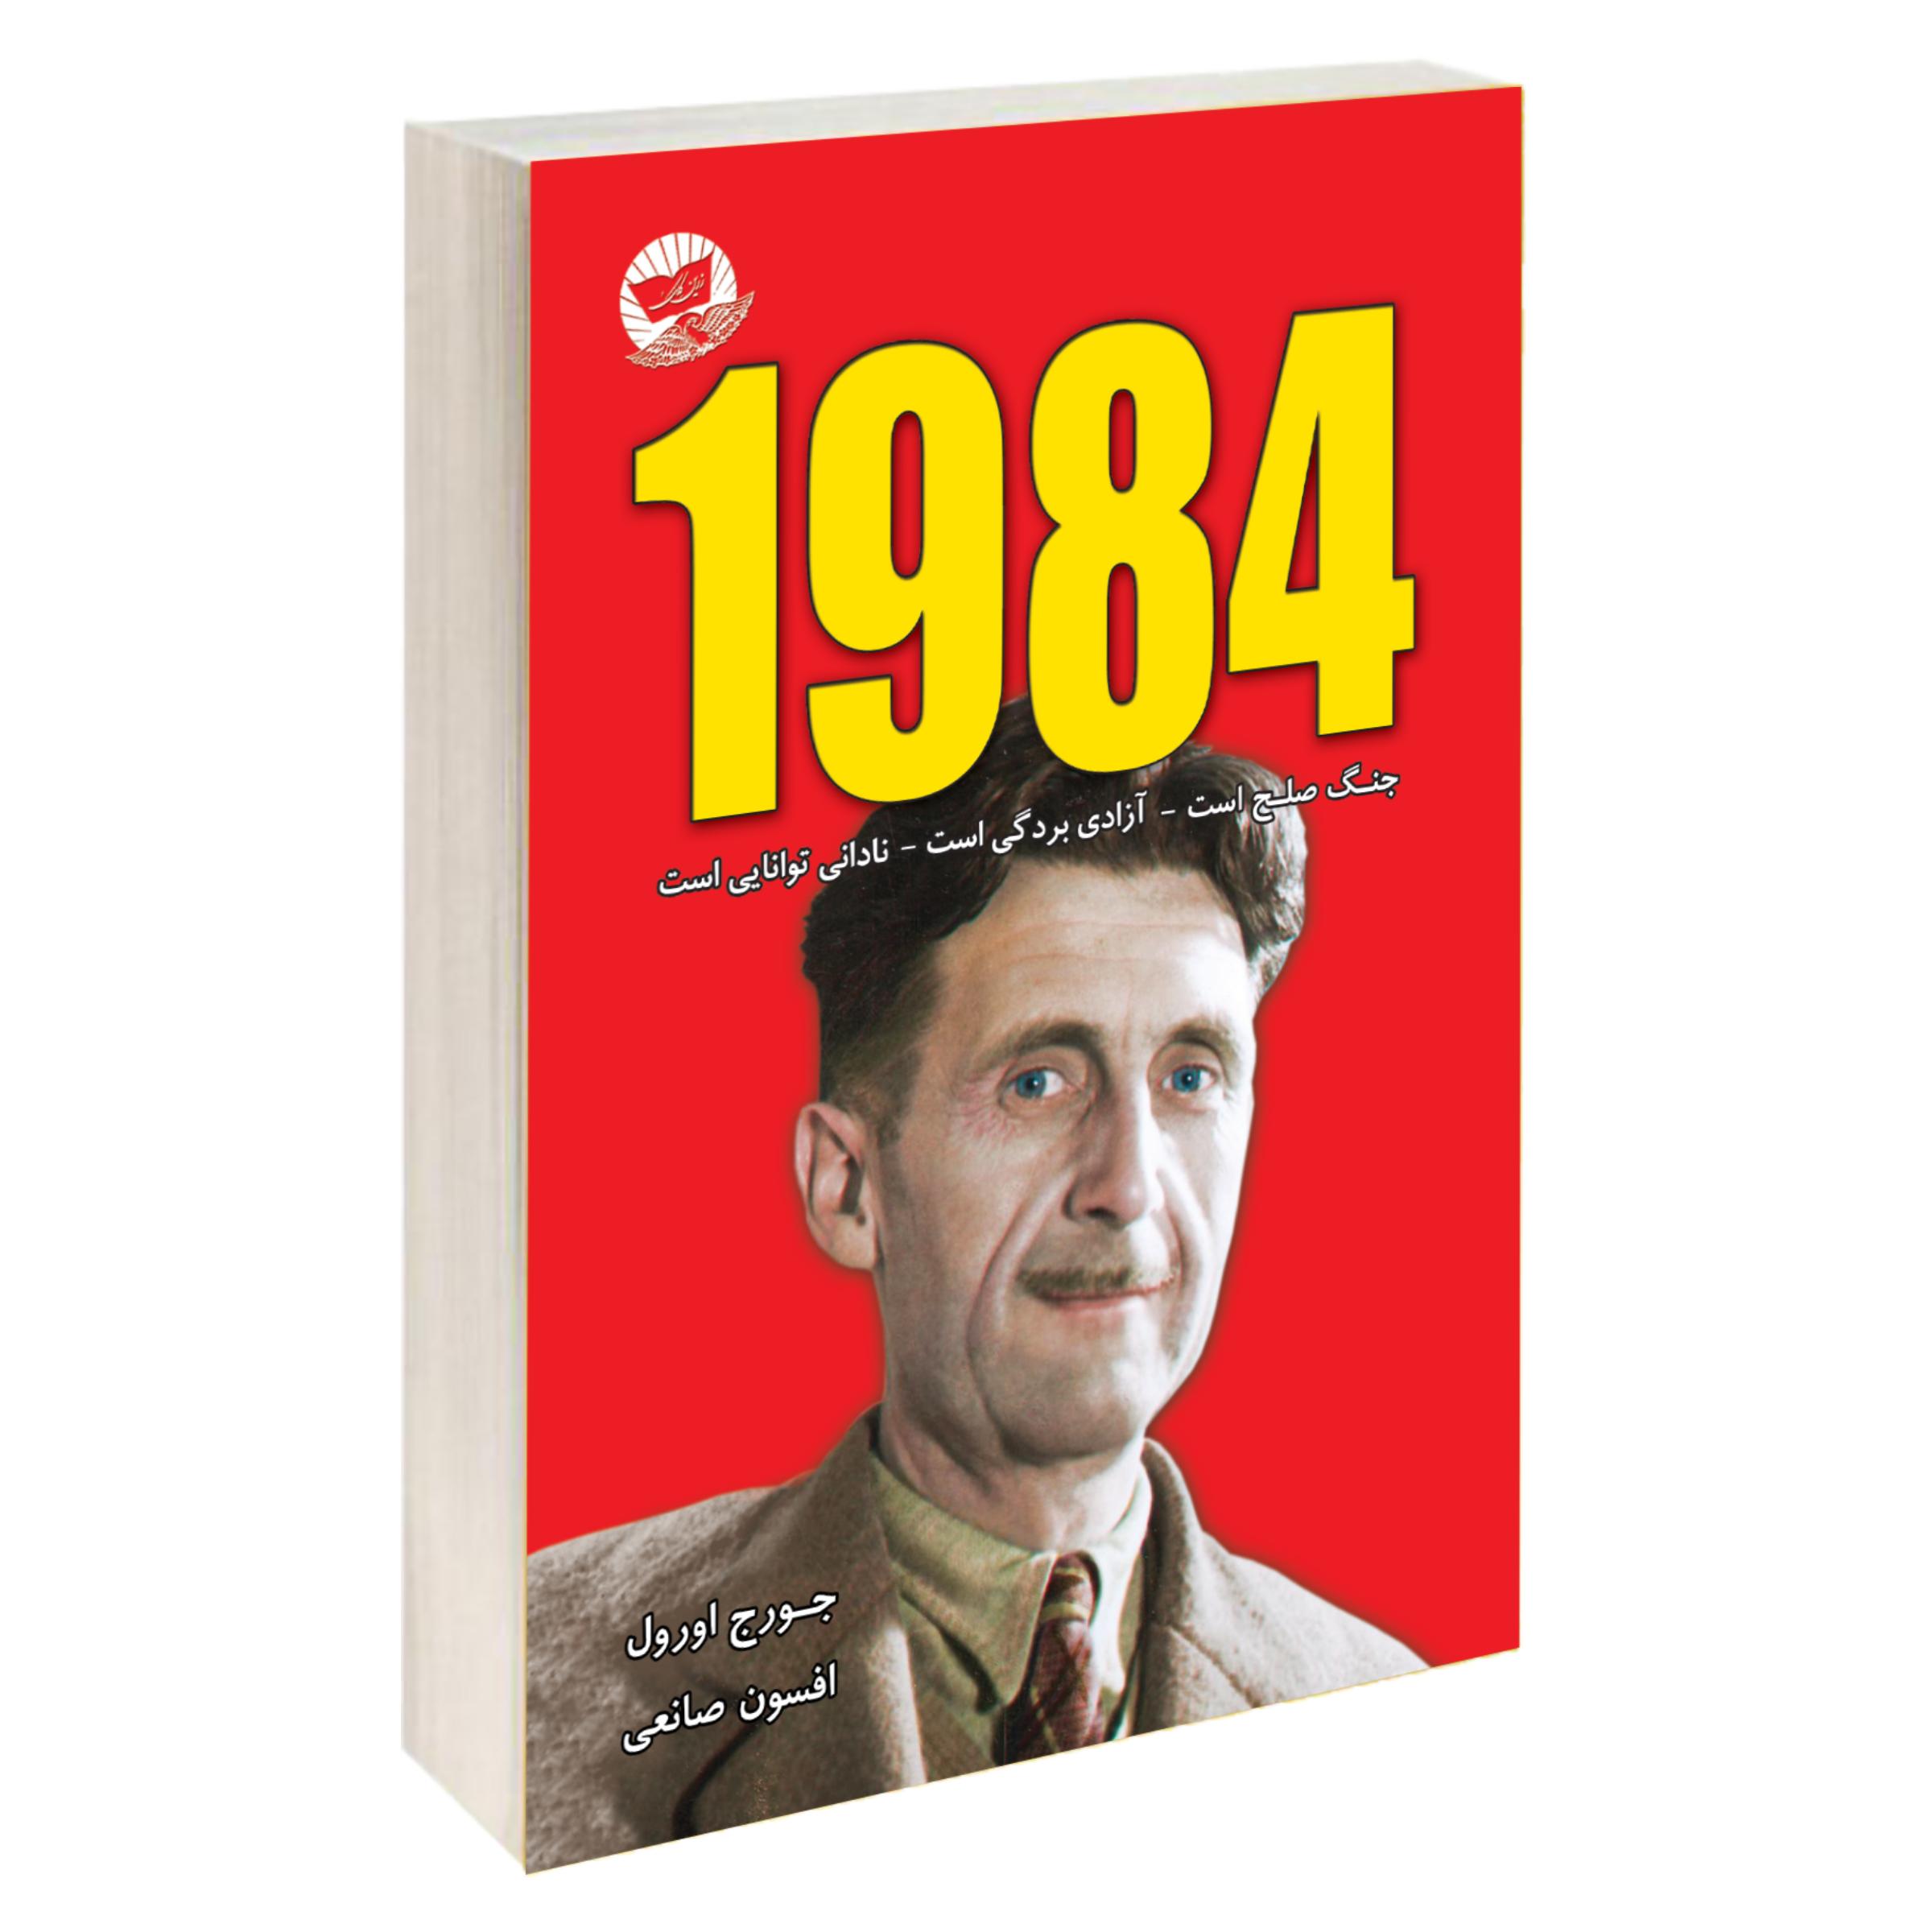 خرید                      کتاب 1984 اثر جورج اورول  انتشارات زرین کلک